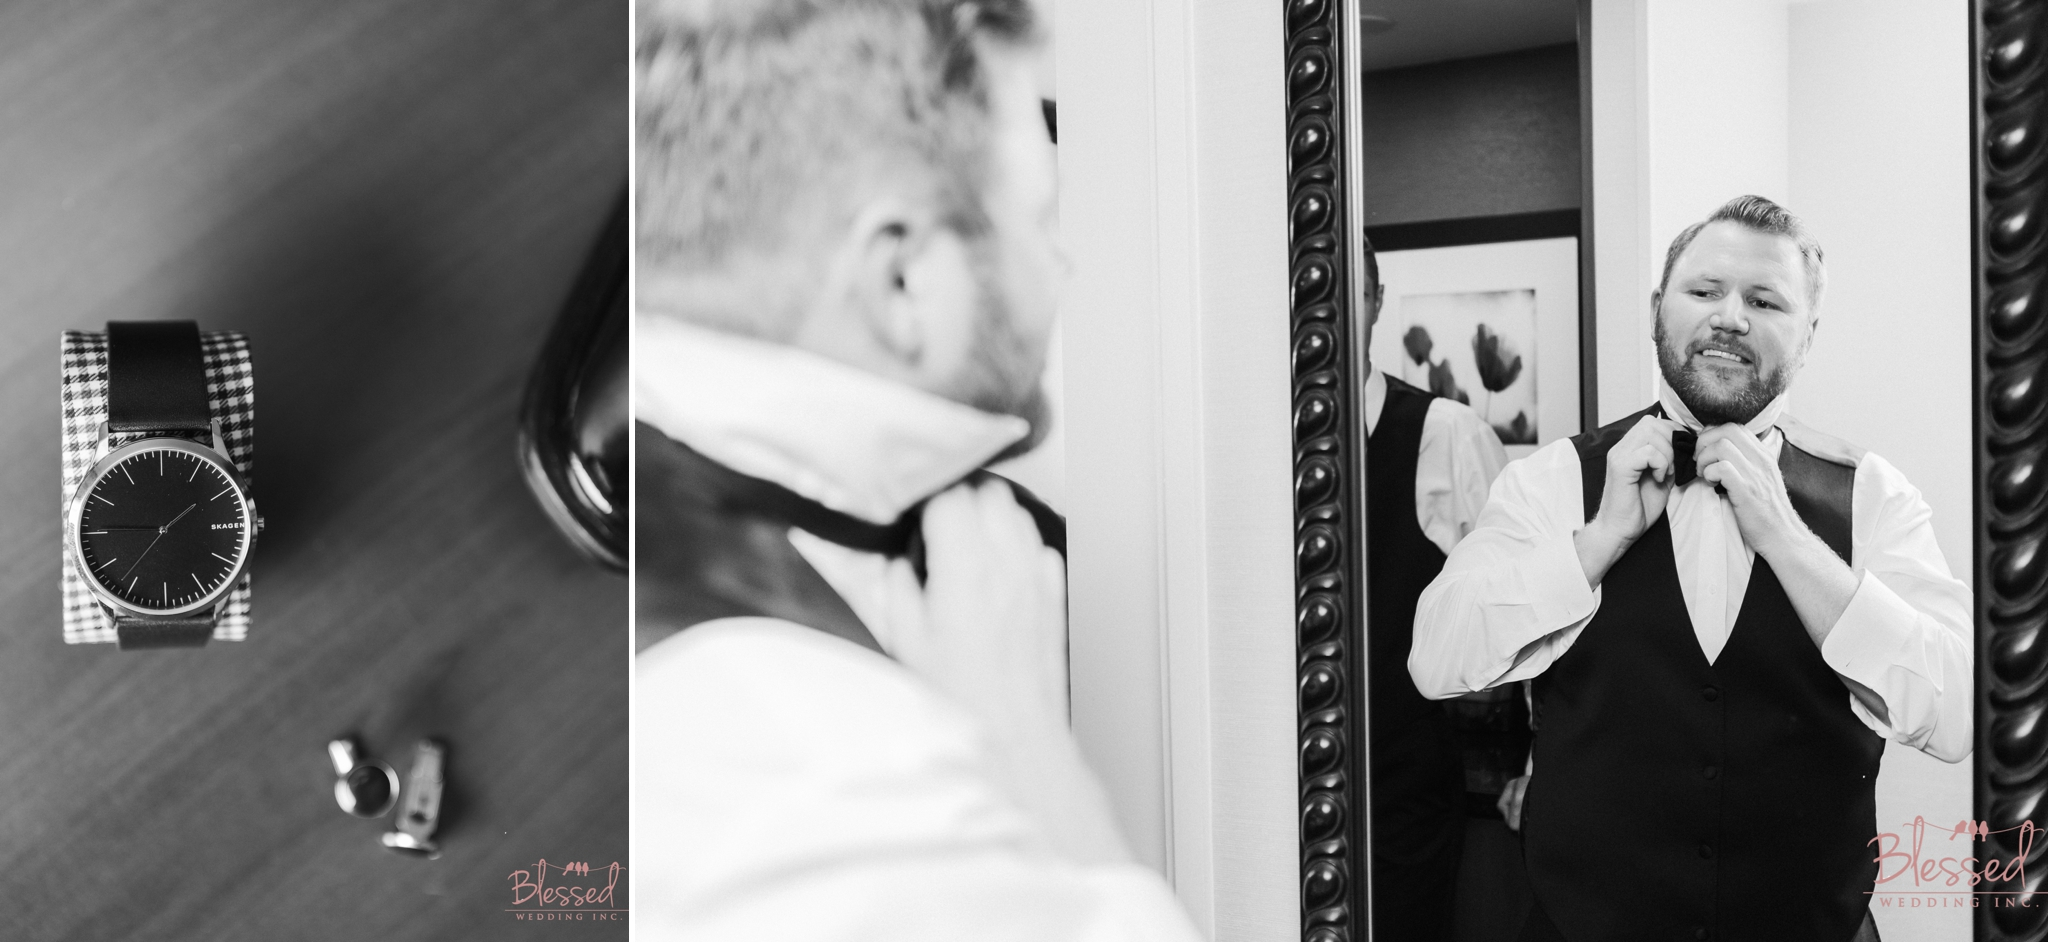 Orfila Vinery Wedding by Blessed Wedding Photography 8.jpg